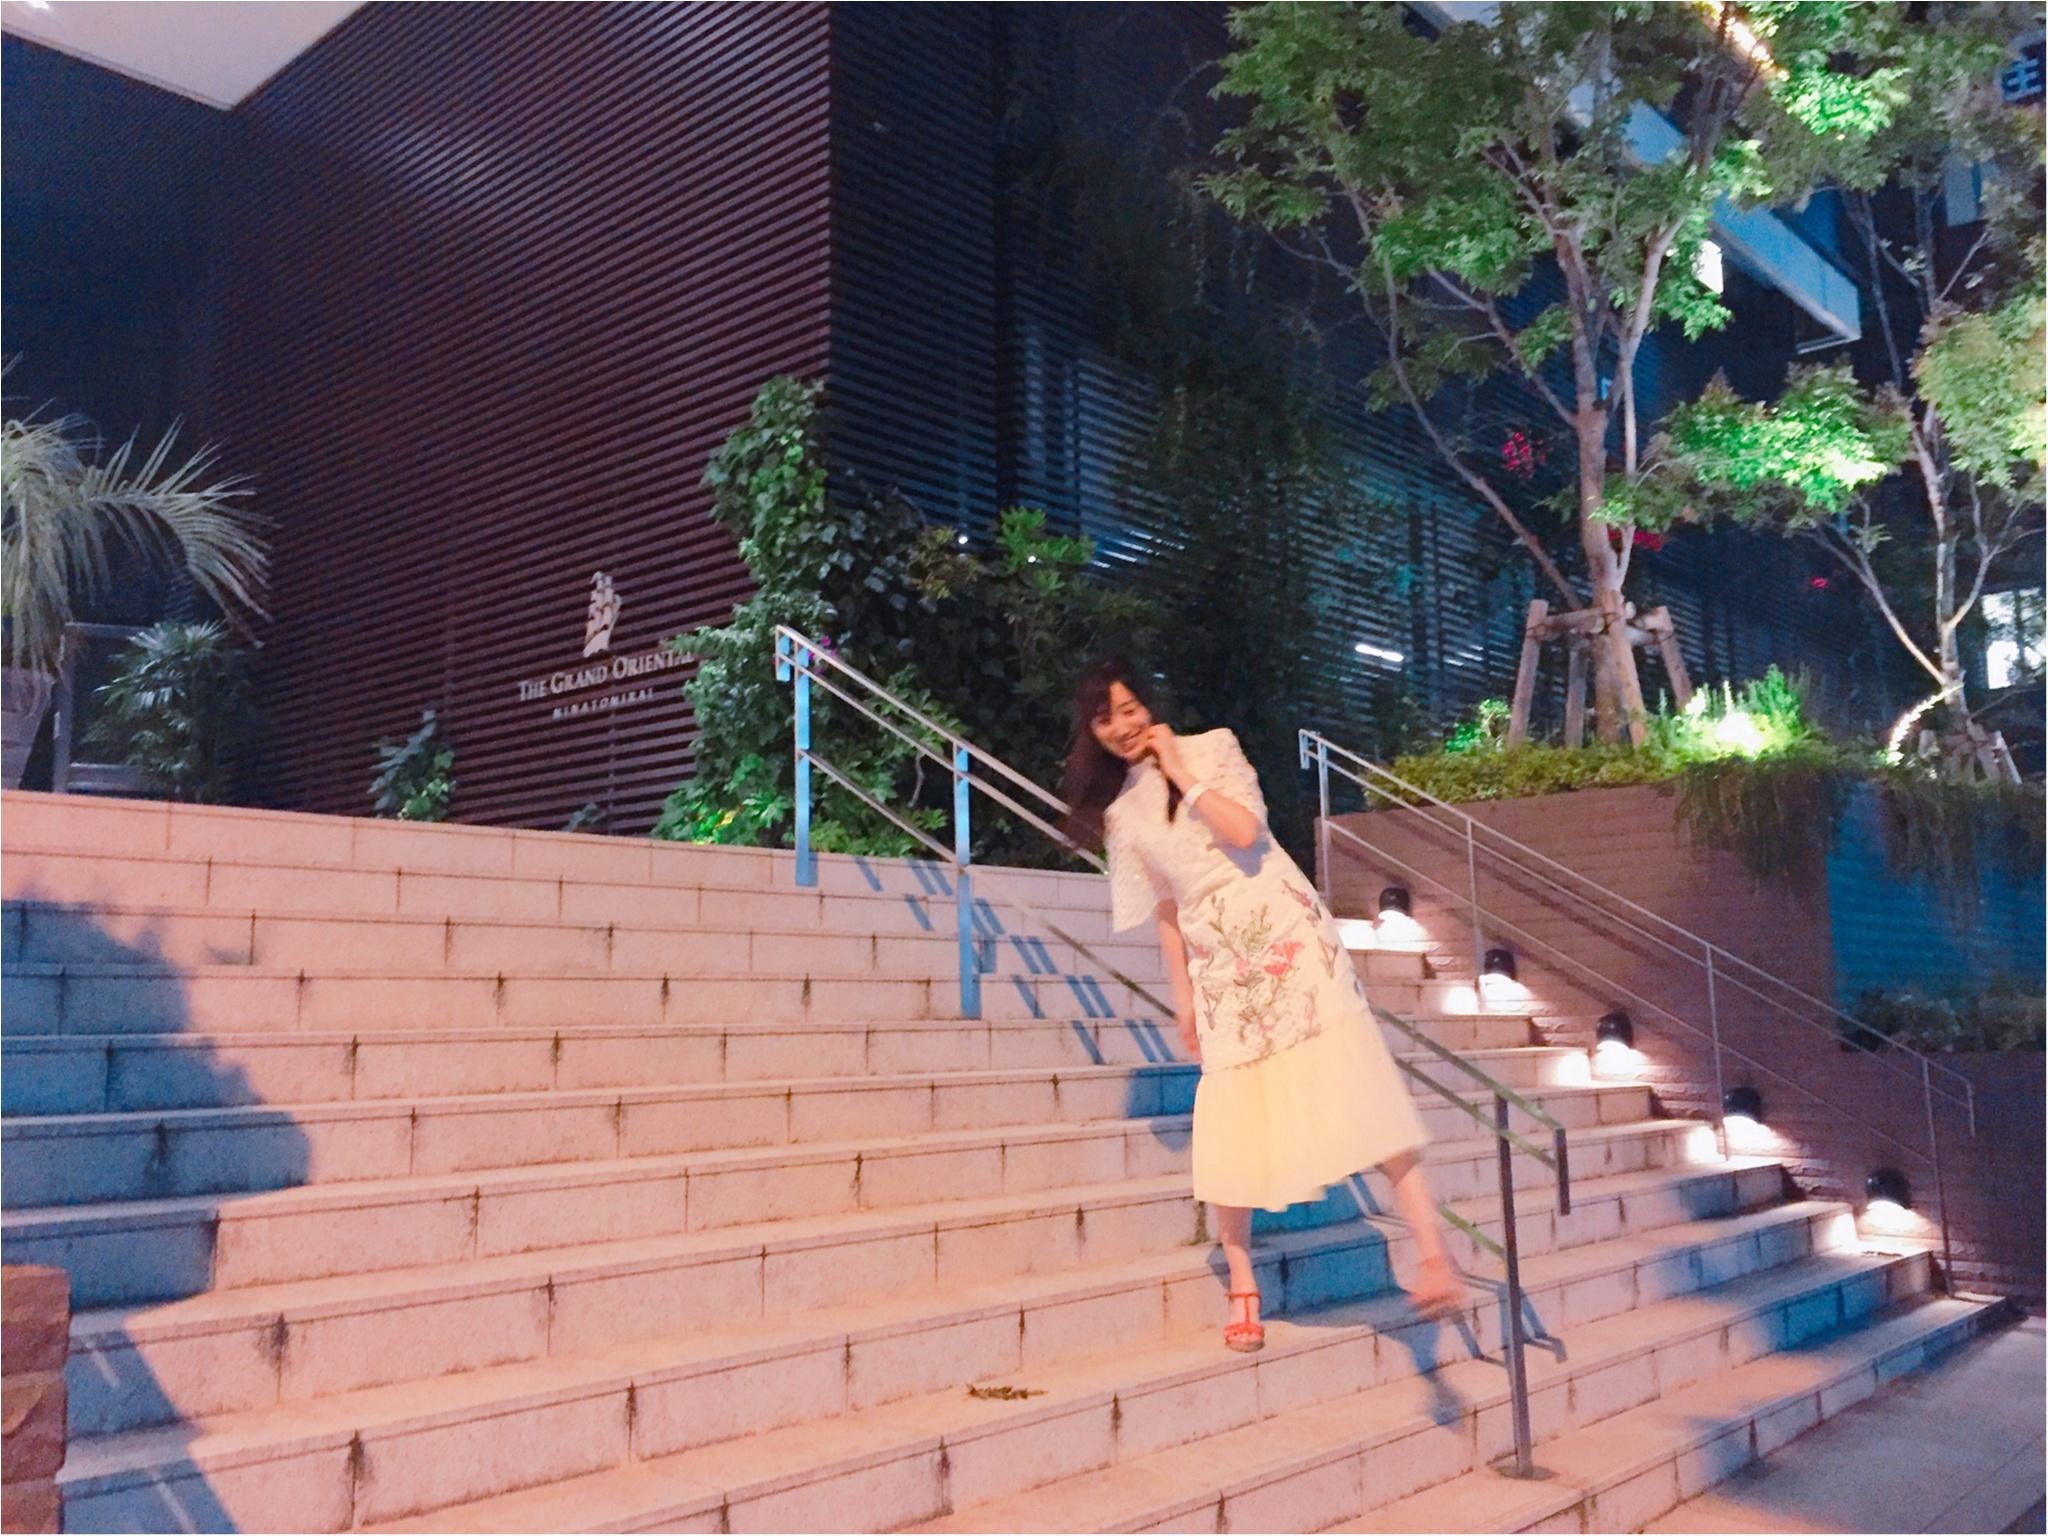 【ZARA】刺繍入りレースワンピース(¥7,990)がクラシカルで可愛い♡_6